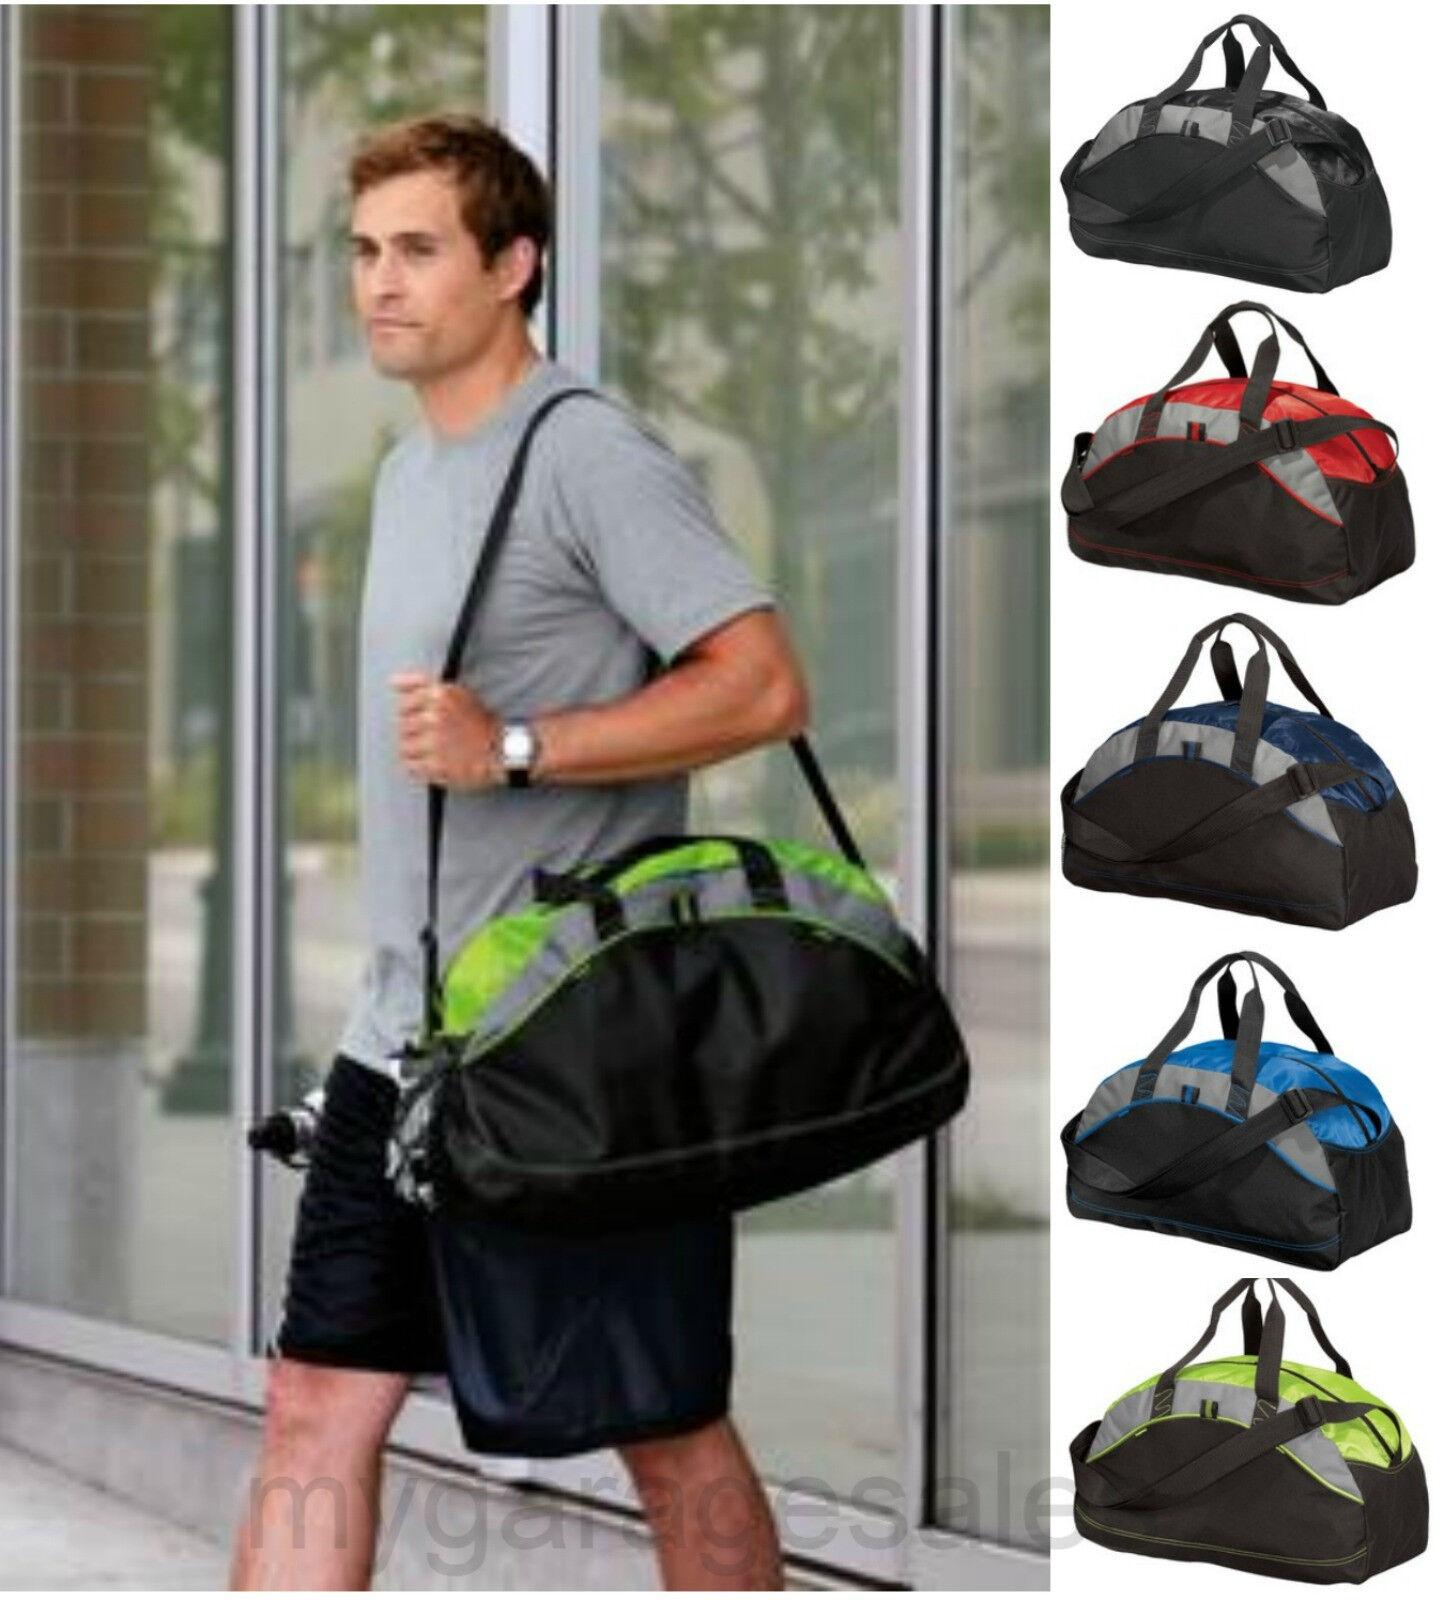 Medium Duffel Gym Bag Workout Sport Travel Carryon Athletic